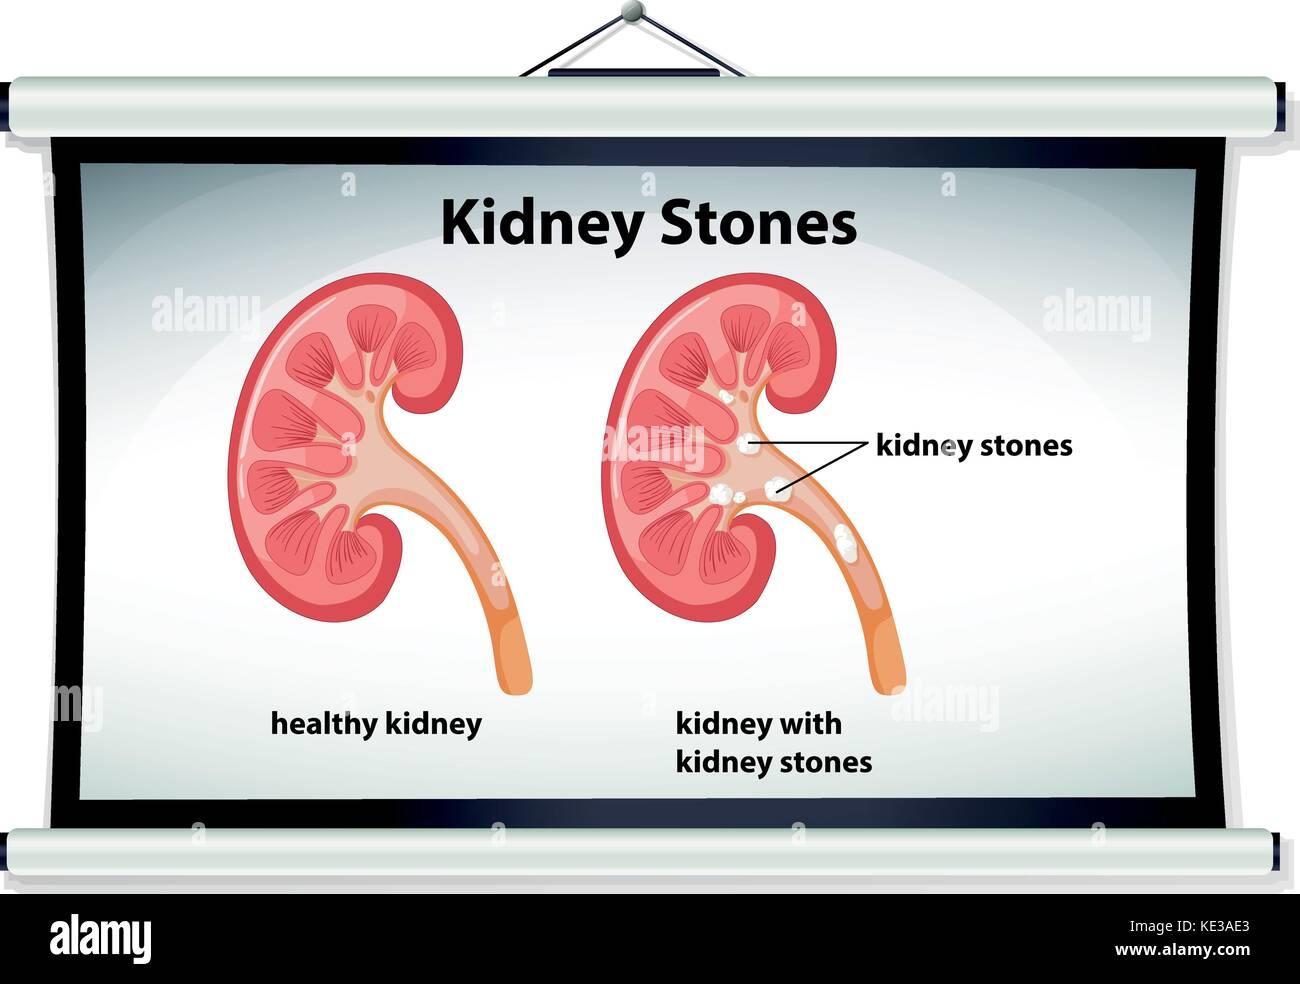 Kidney Stone Human Stock Photos & Kidney Stone Human Stock Images ...